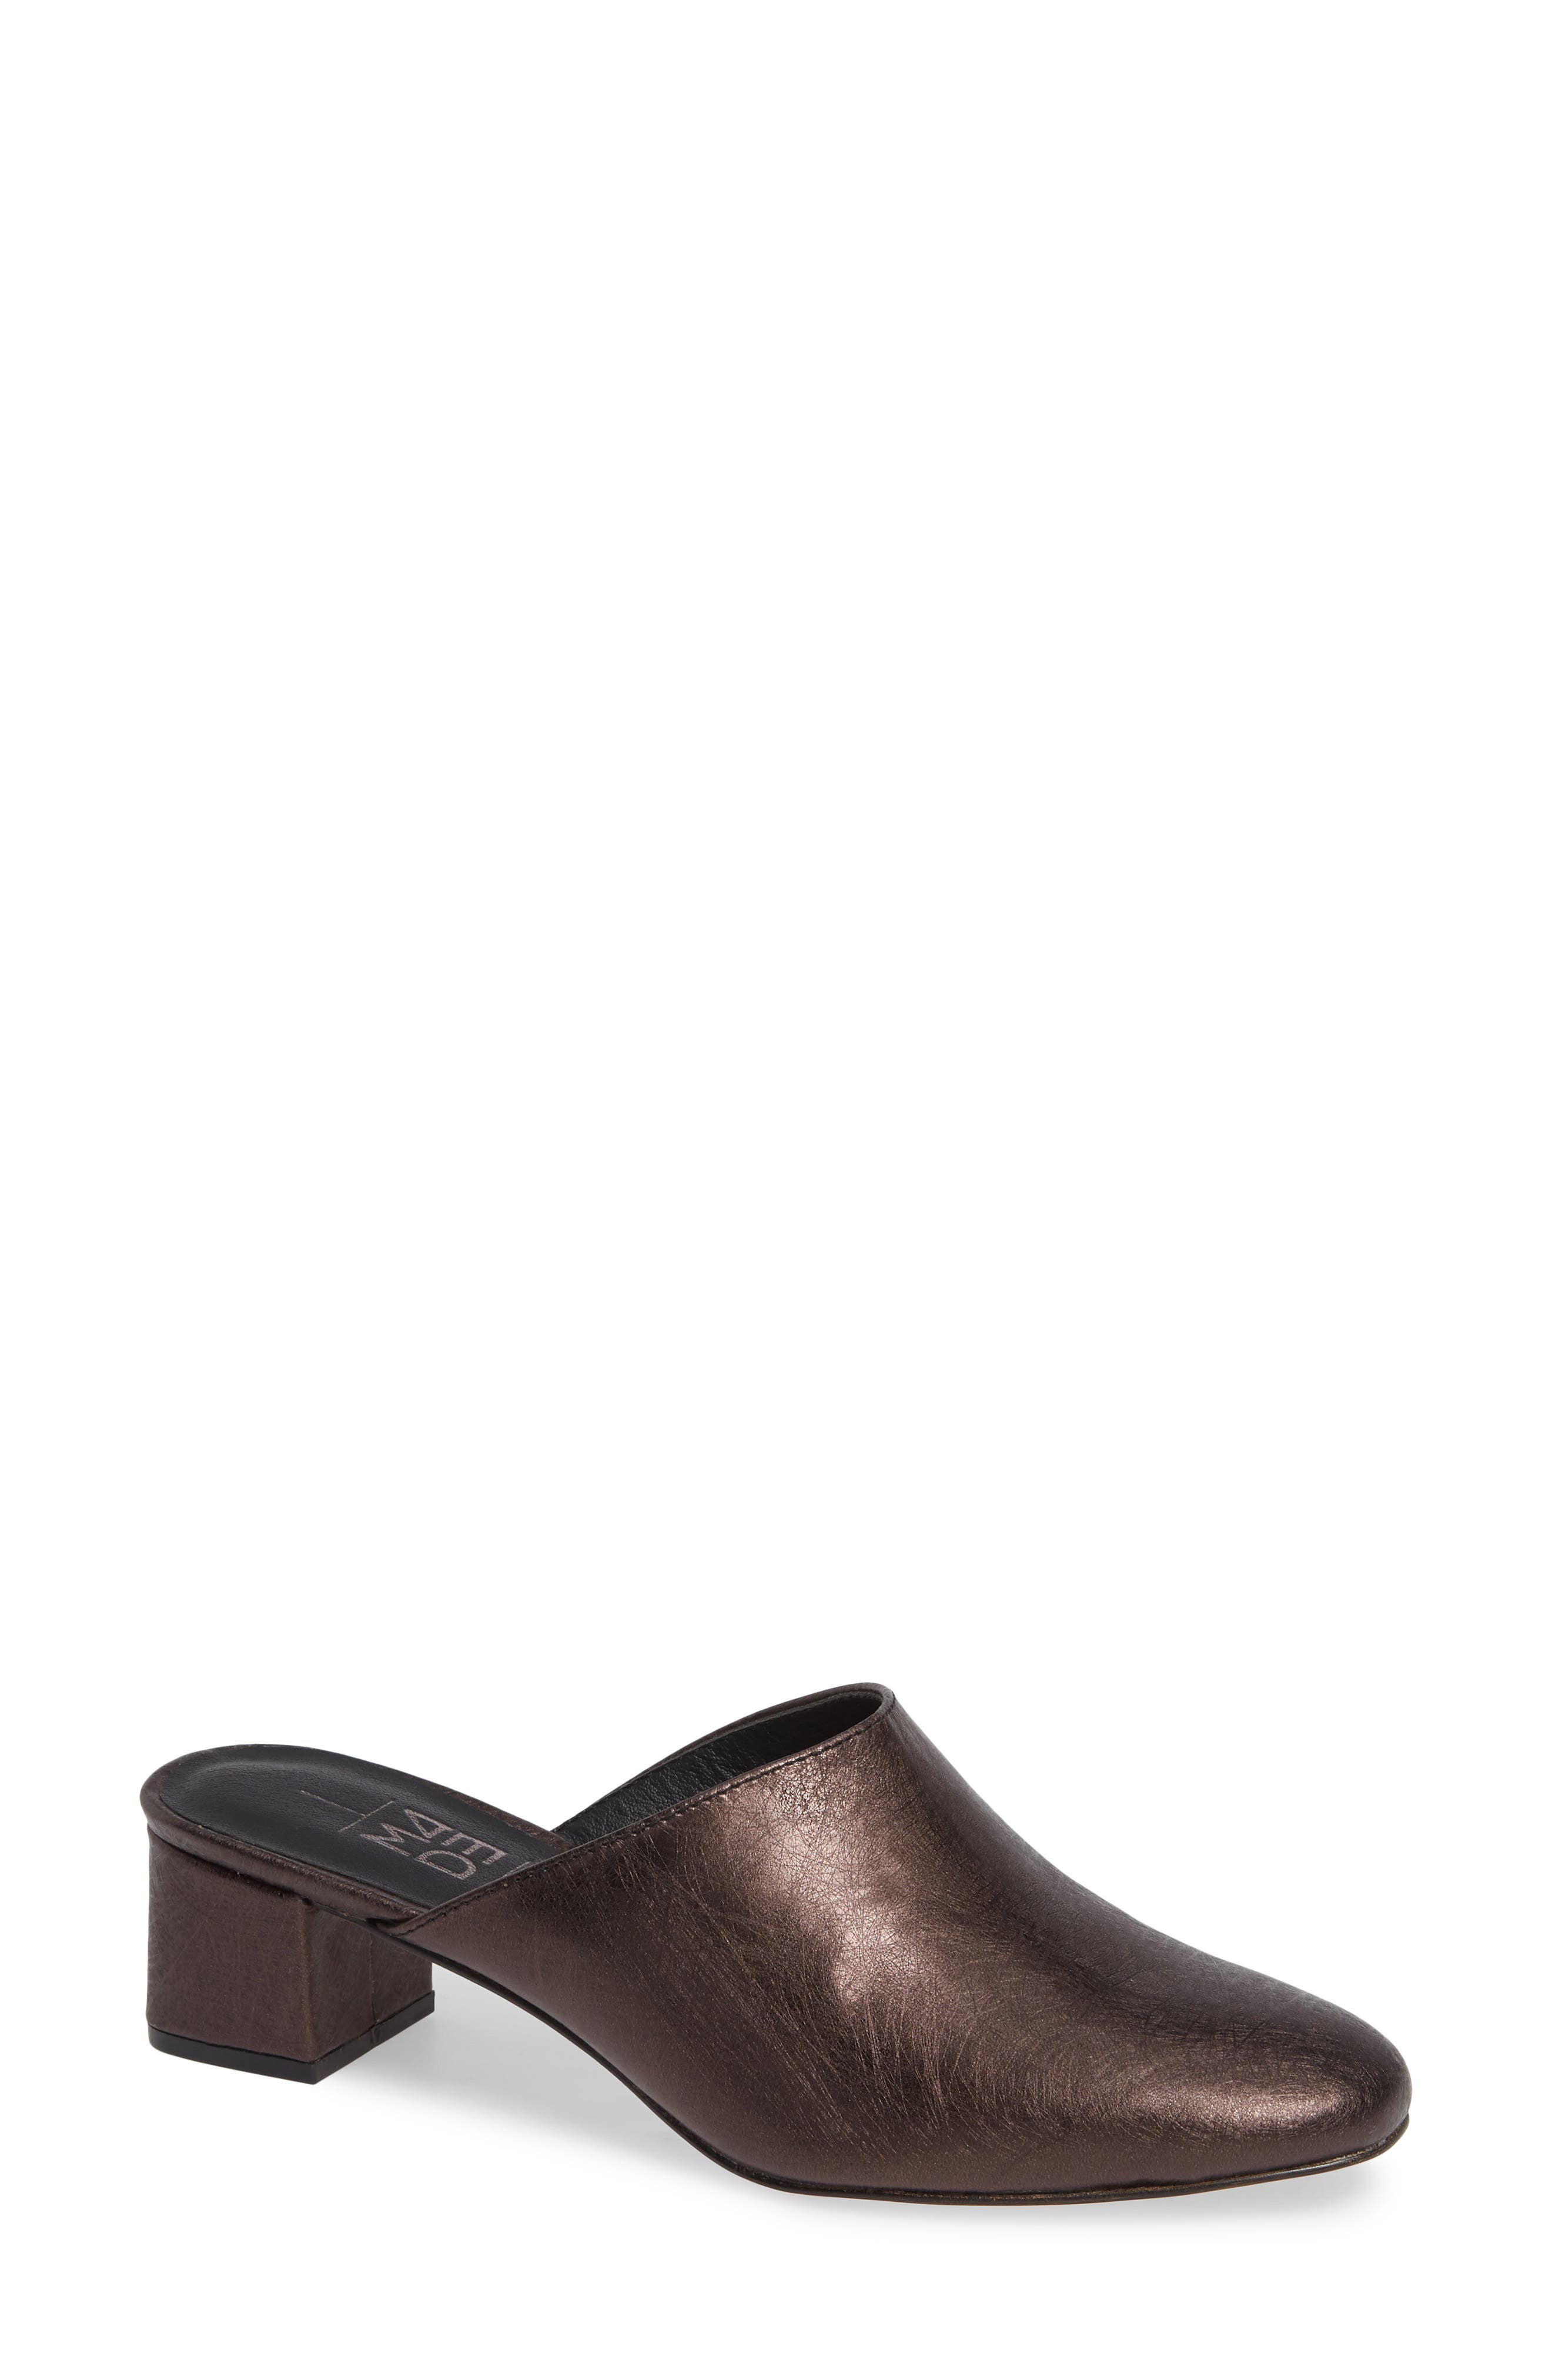 M4D3 Maddox Block Heel Mule- Black